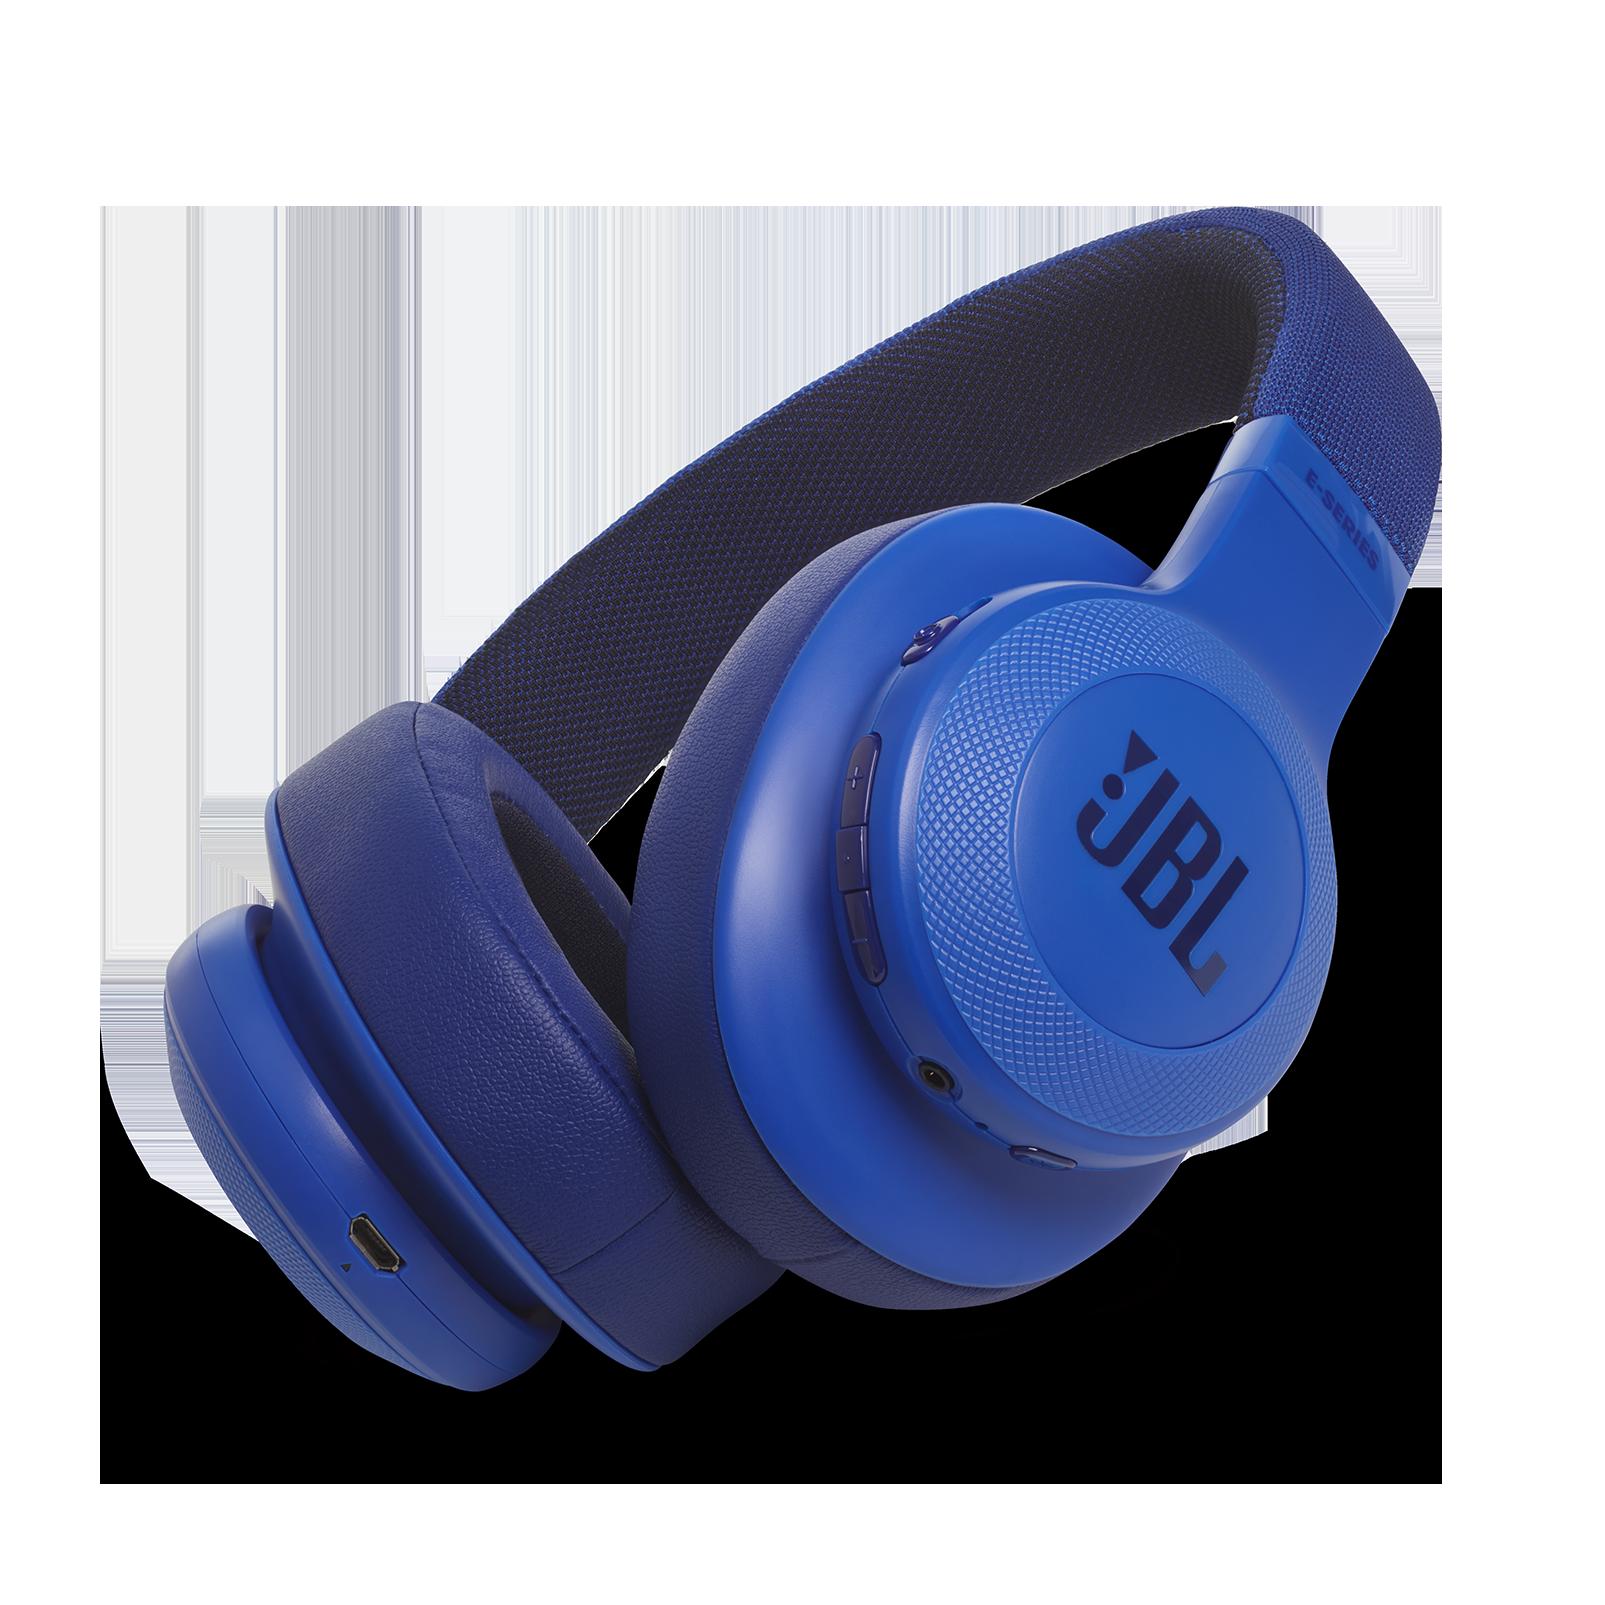 JBL E55BT - Blue - Wireless over-ear headphones - Hero